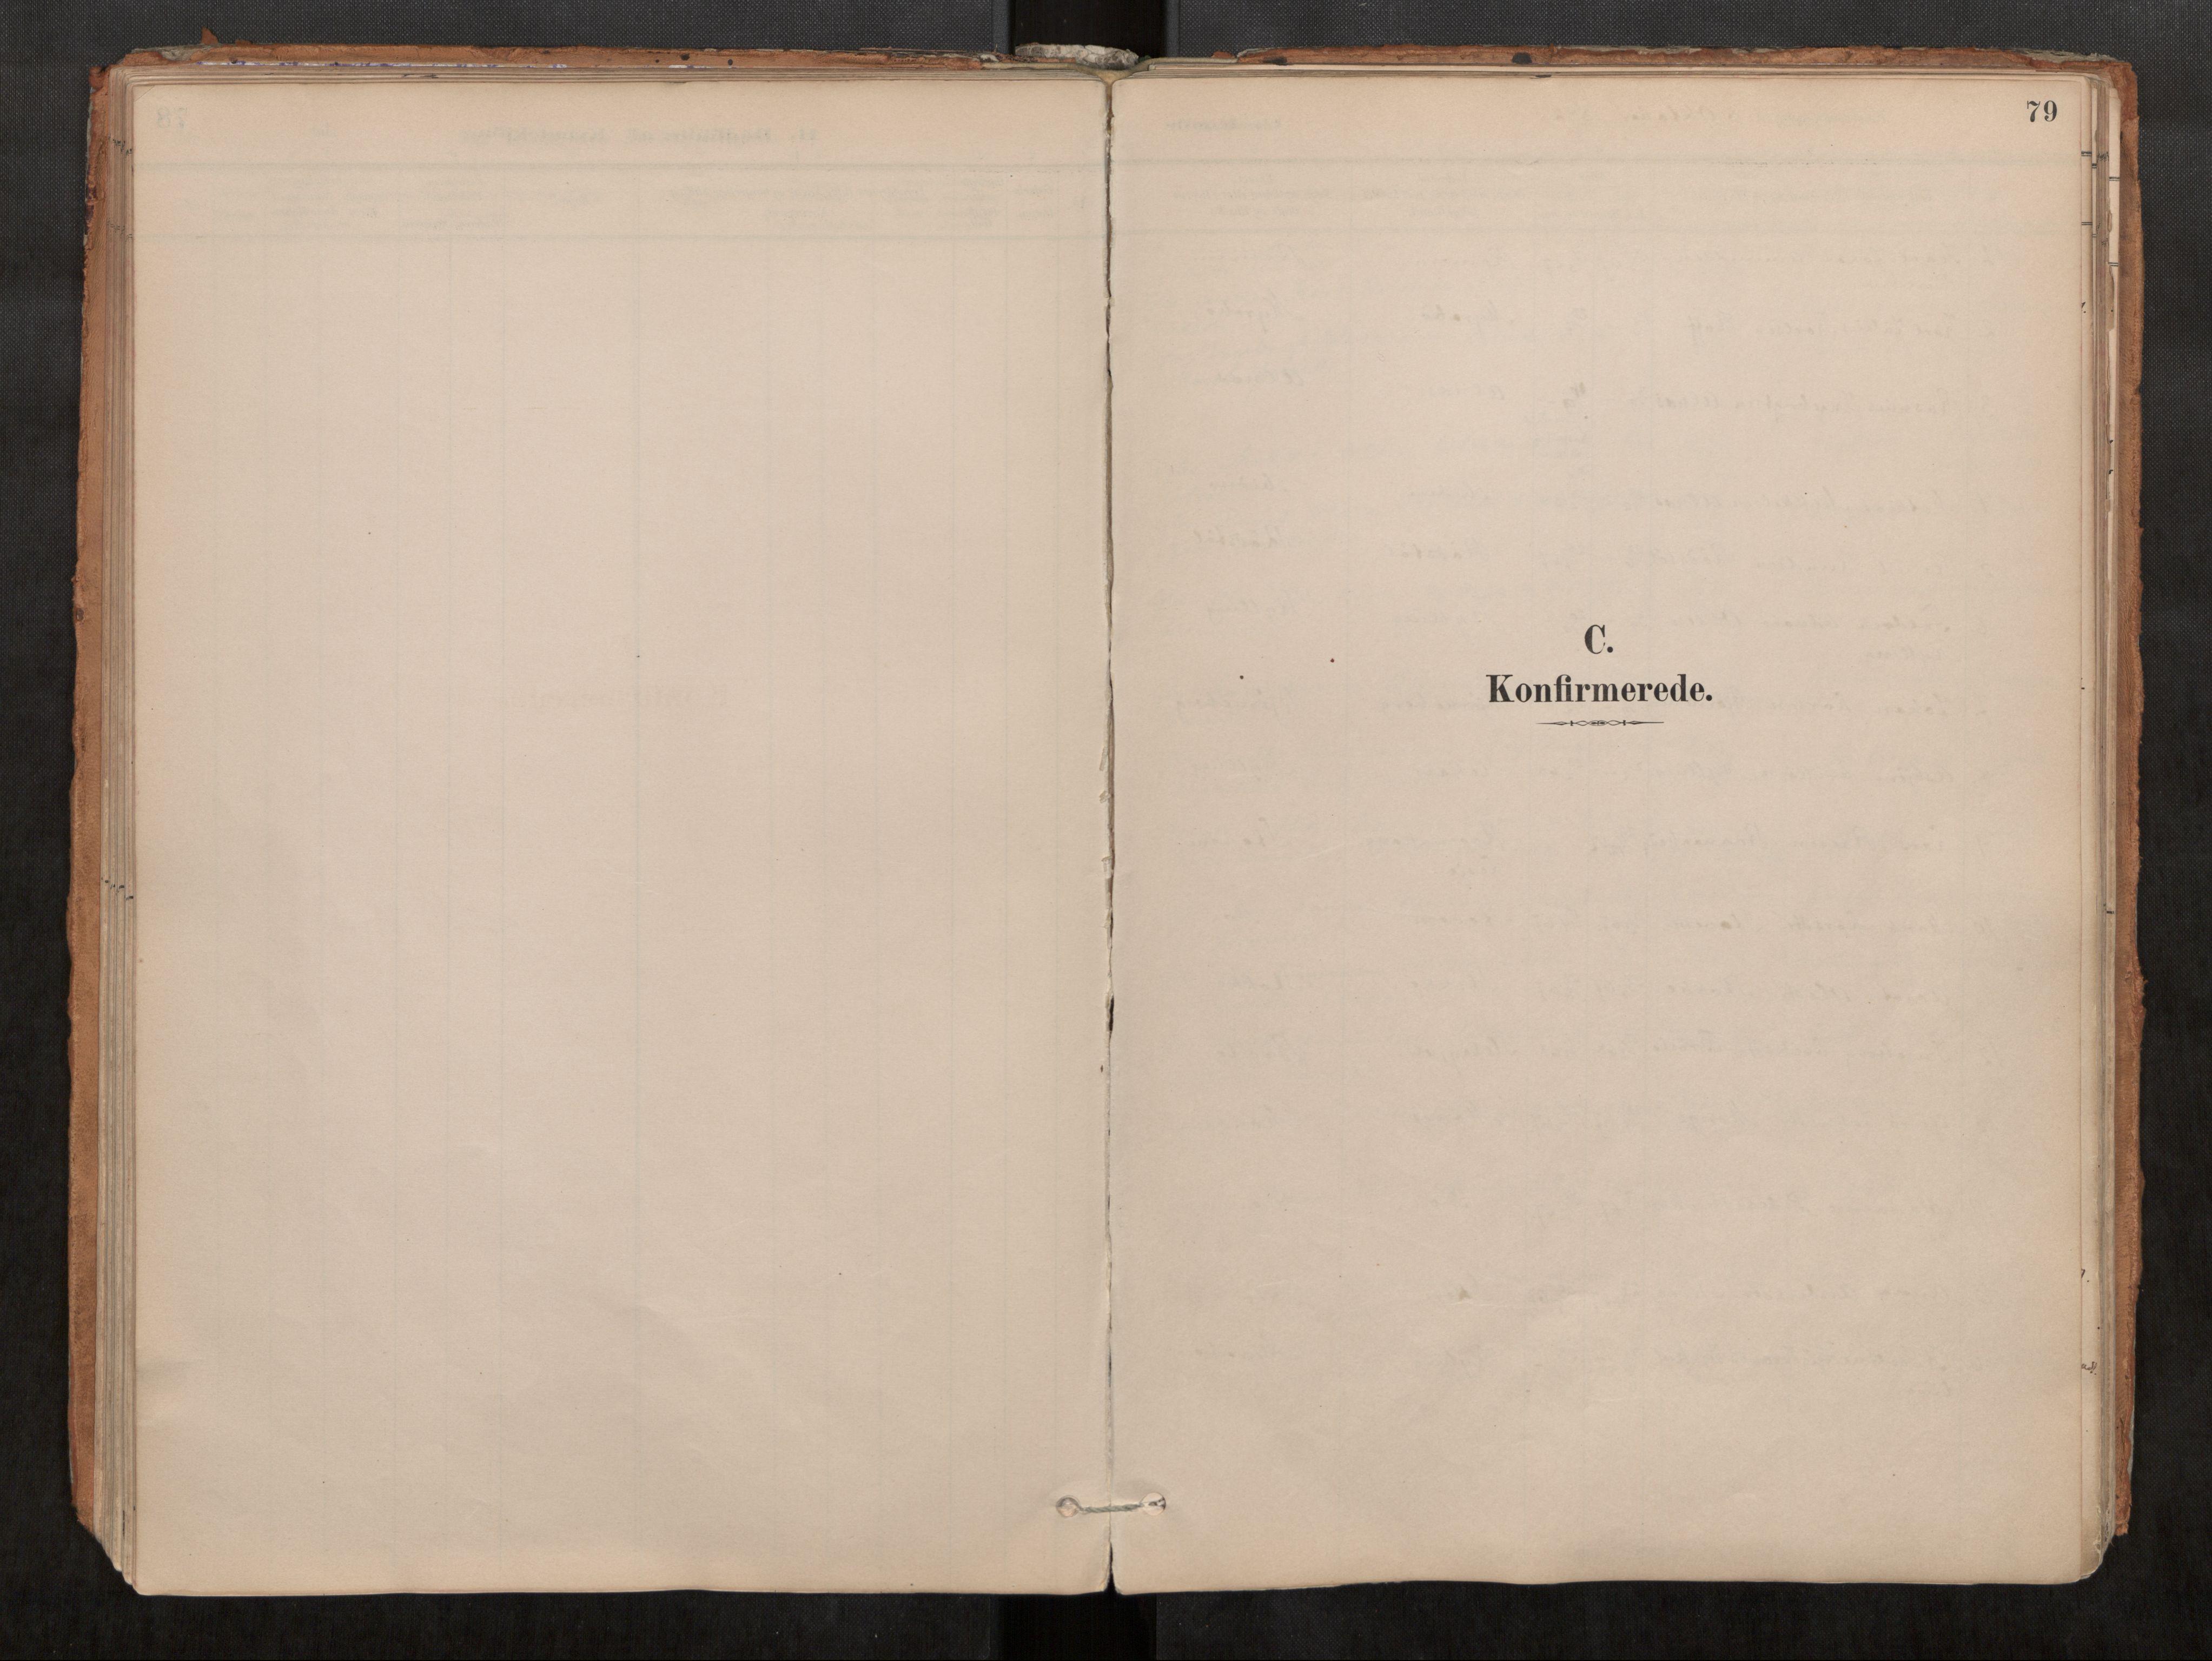 SAT, Grytten sokneprestkontor, Ministerialbok nr. 546A03, 1882-1920, s. 79